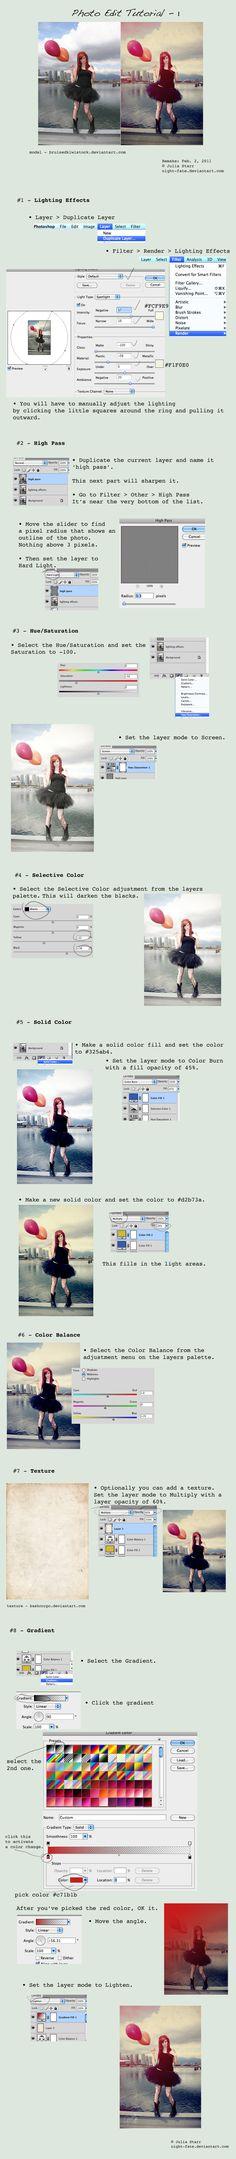 photo edit tutorial - 1 by `night-fate on deviantART